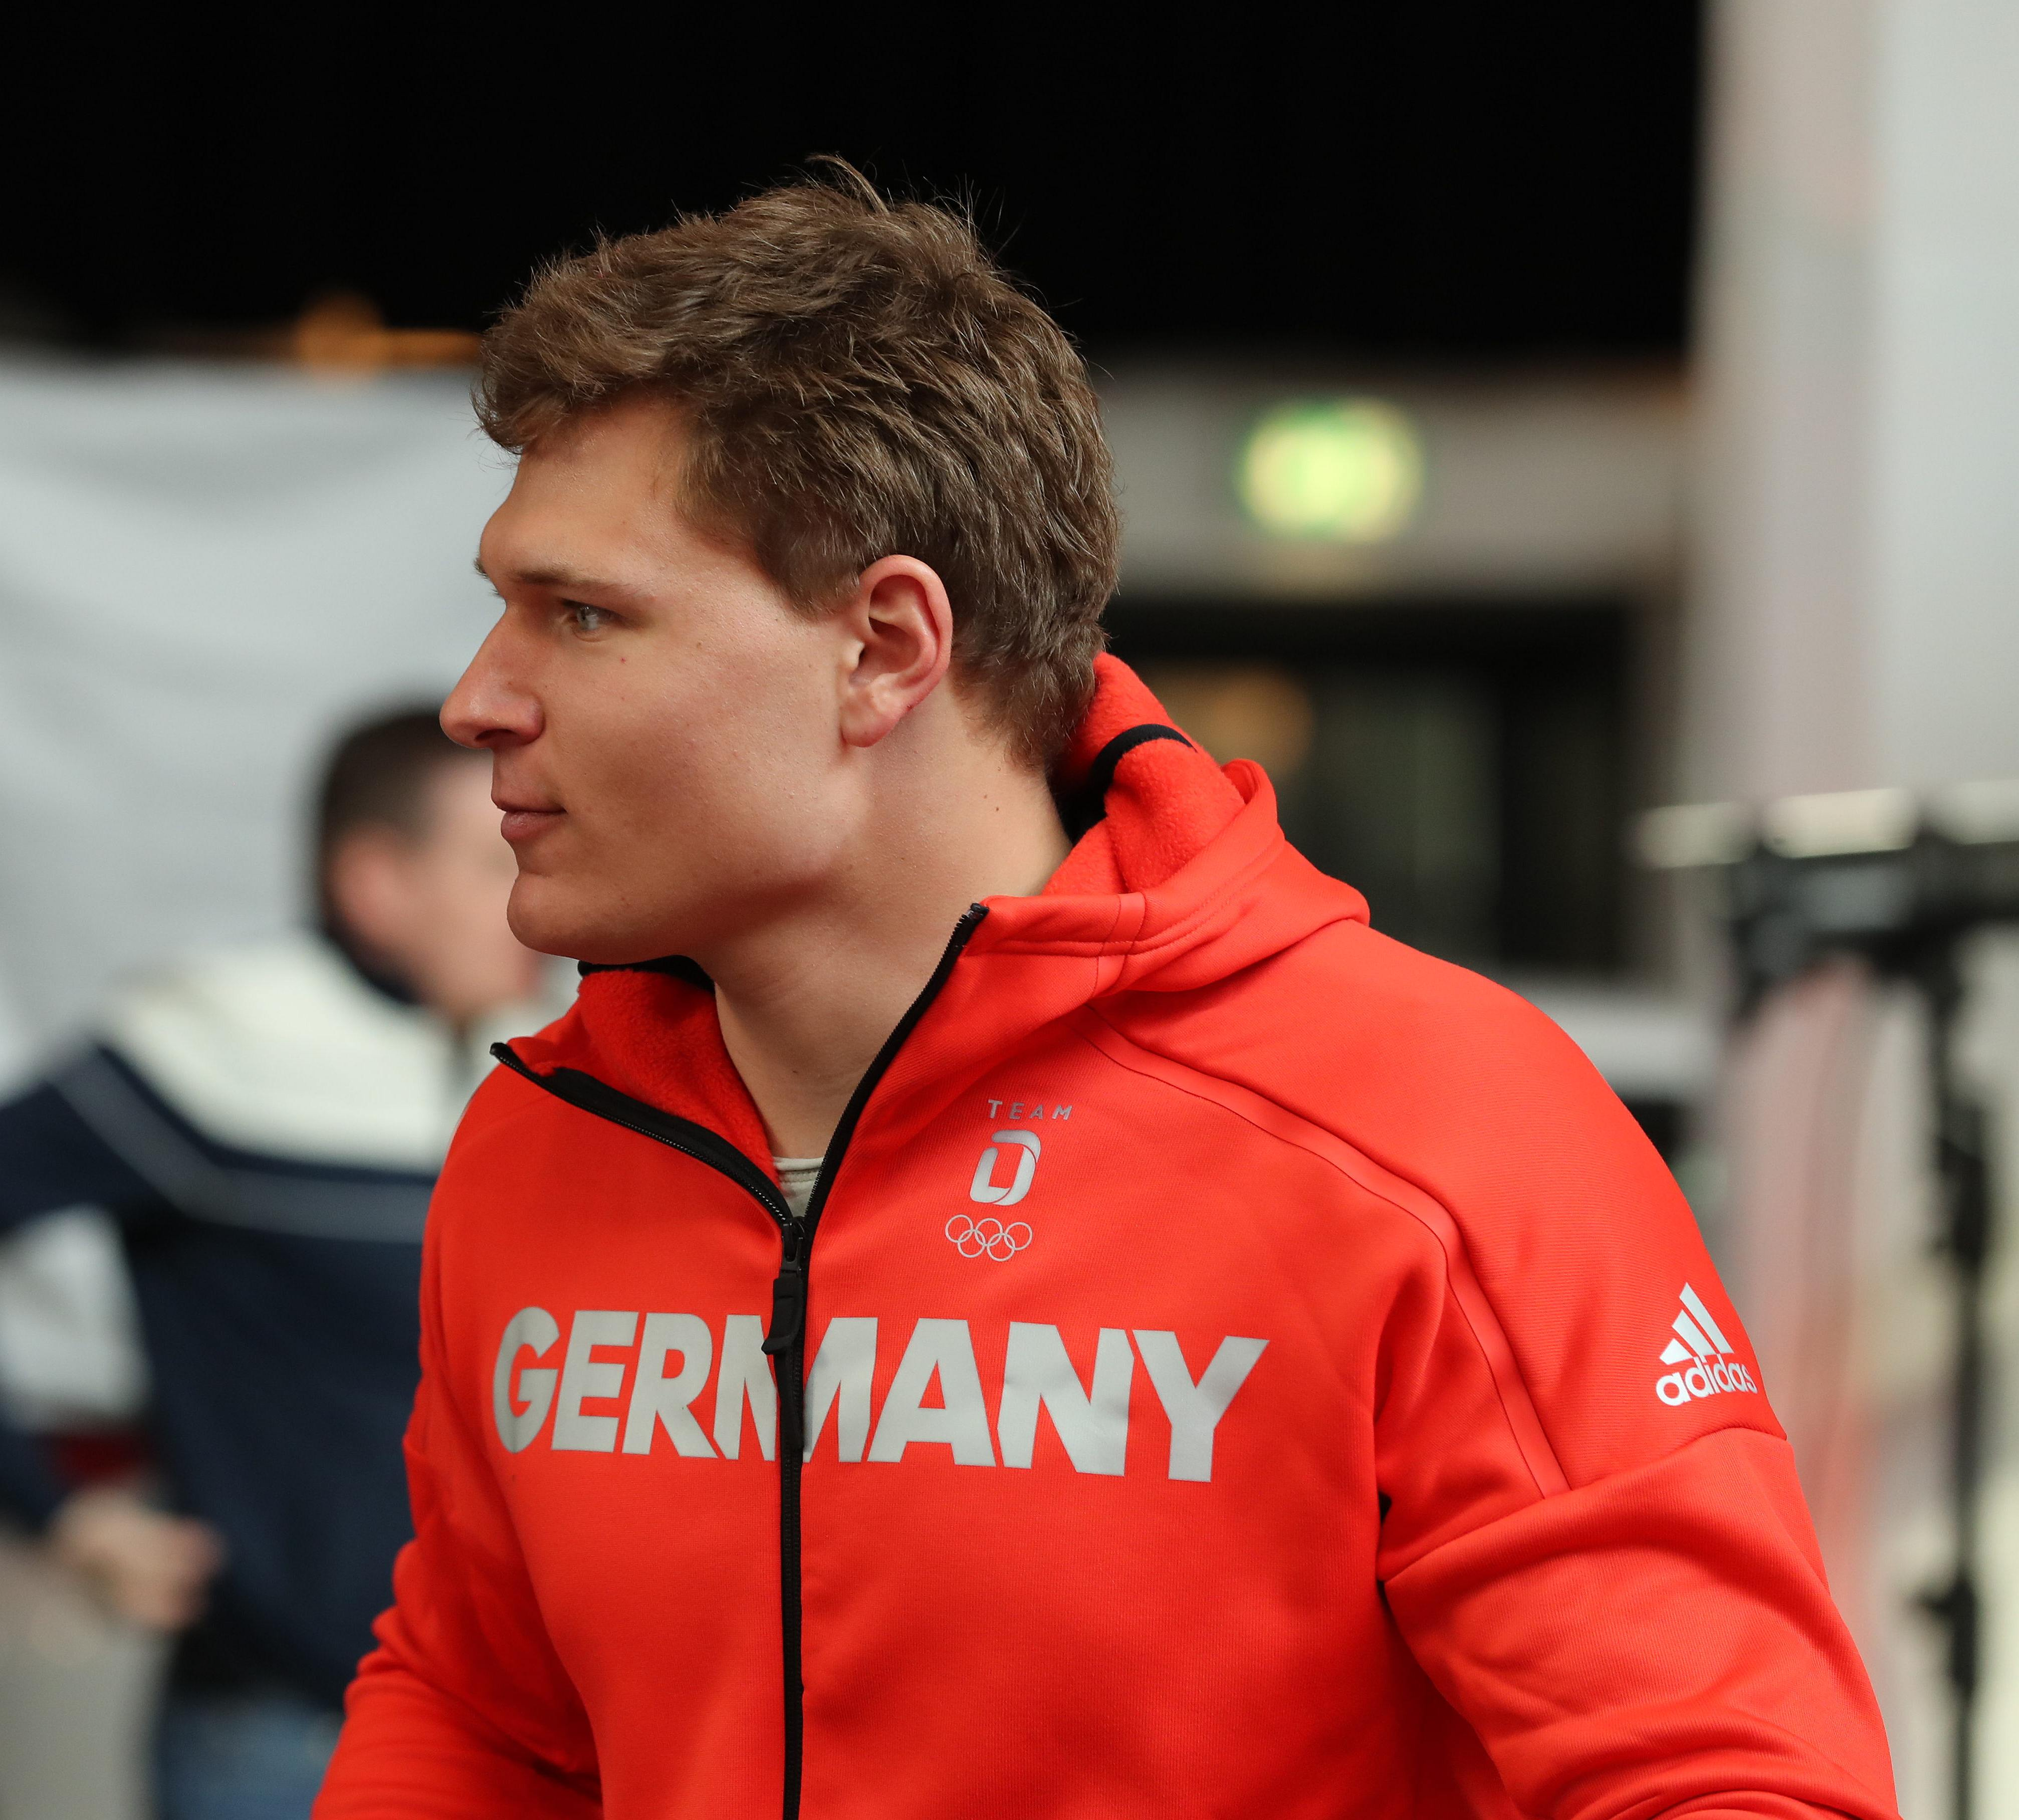 2018martin Rulsch060 Einkleidung München File olympia E2WHID9Y